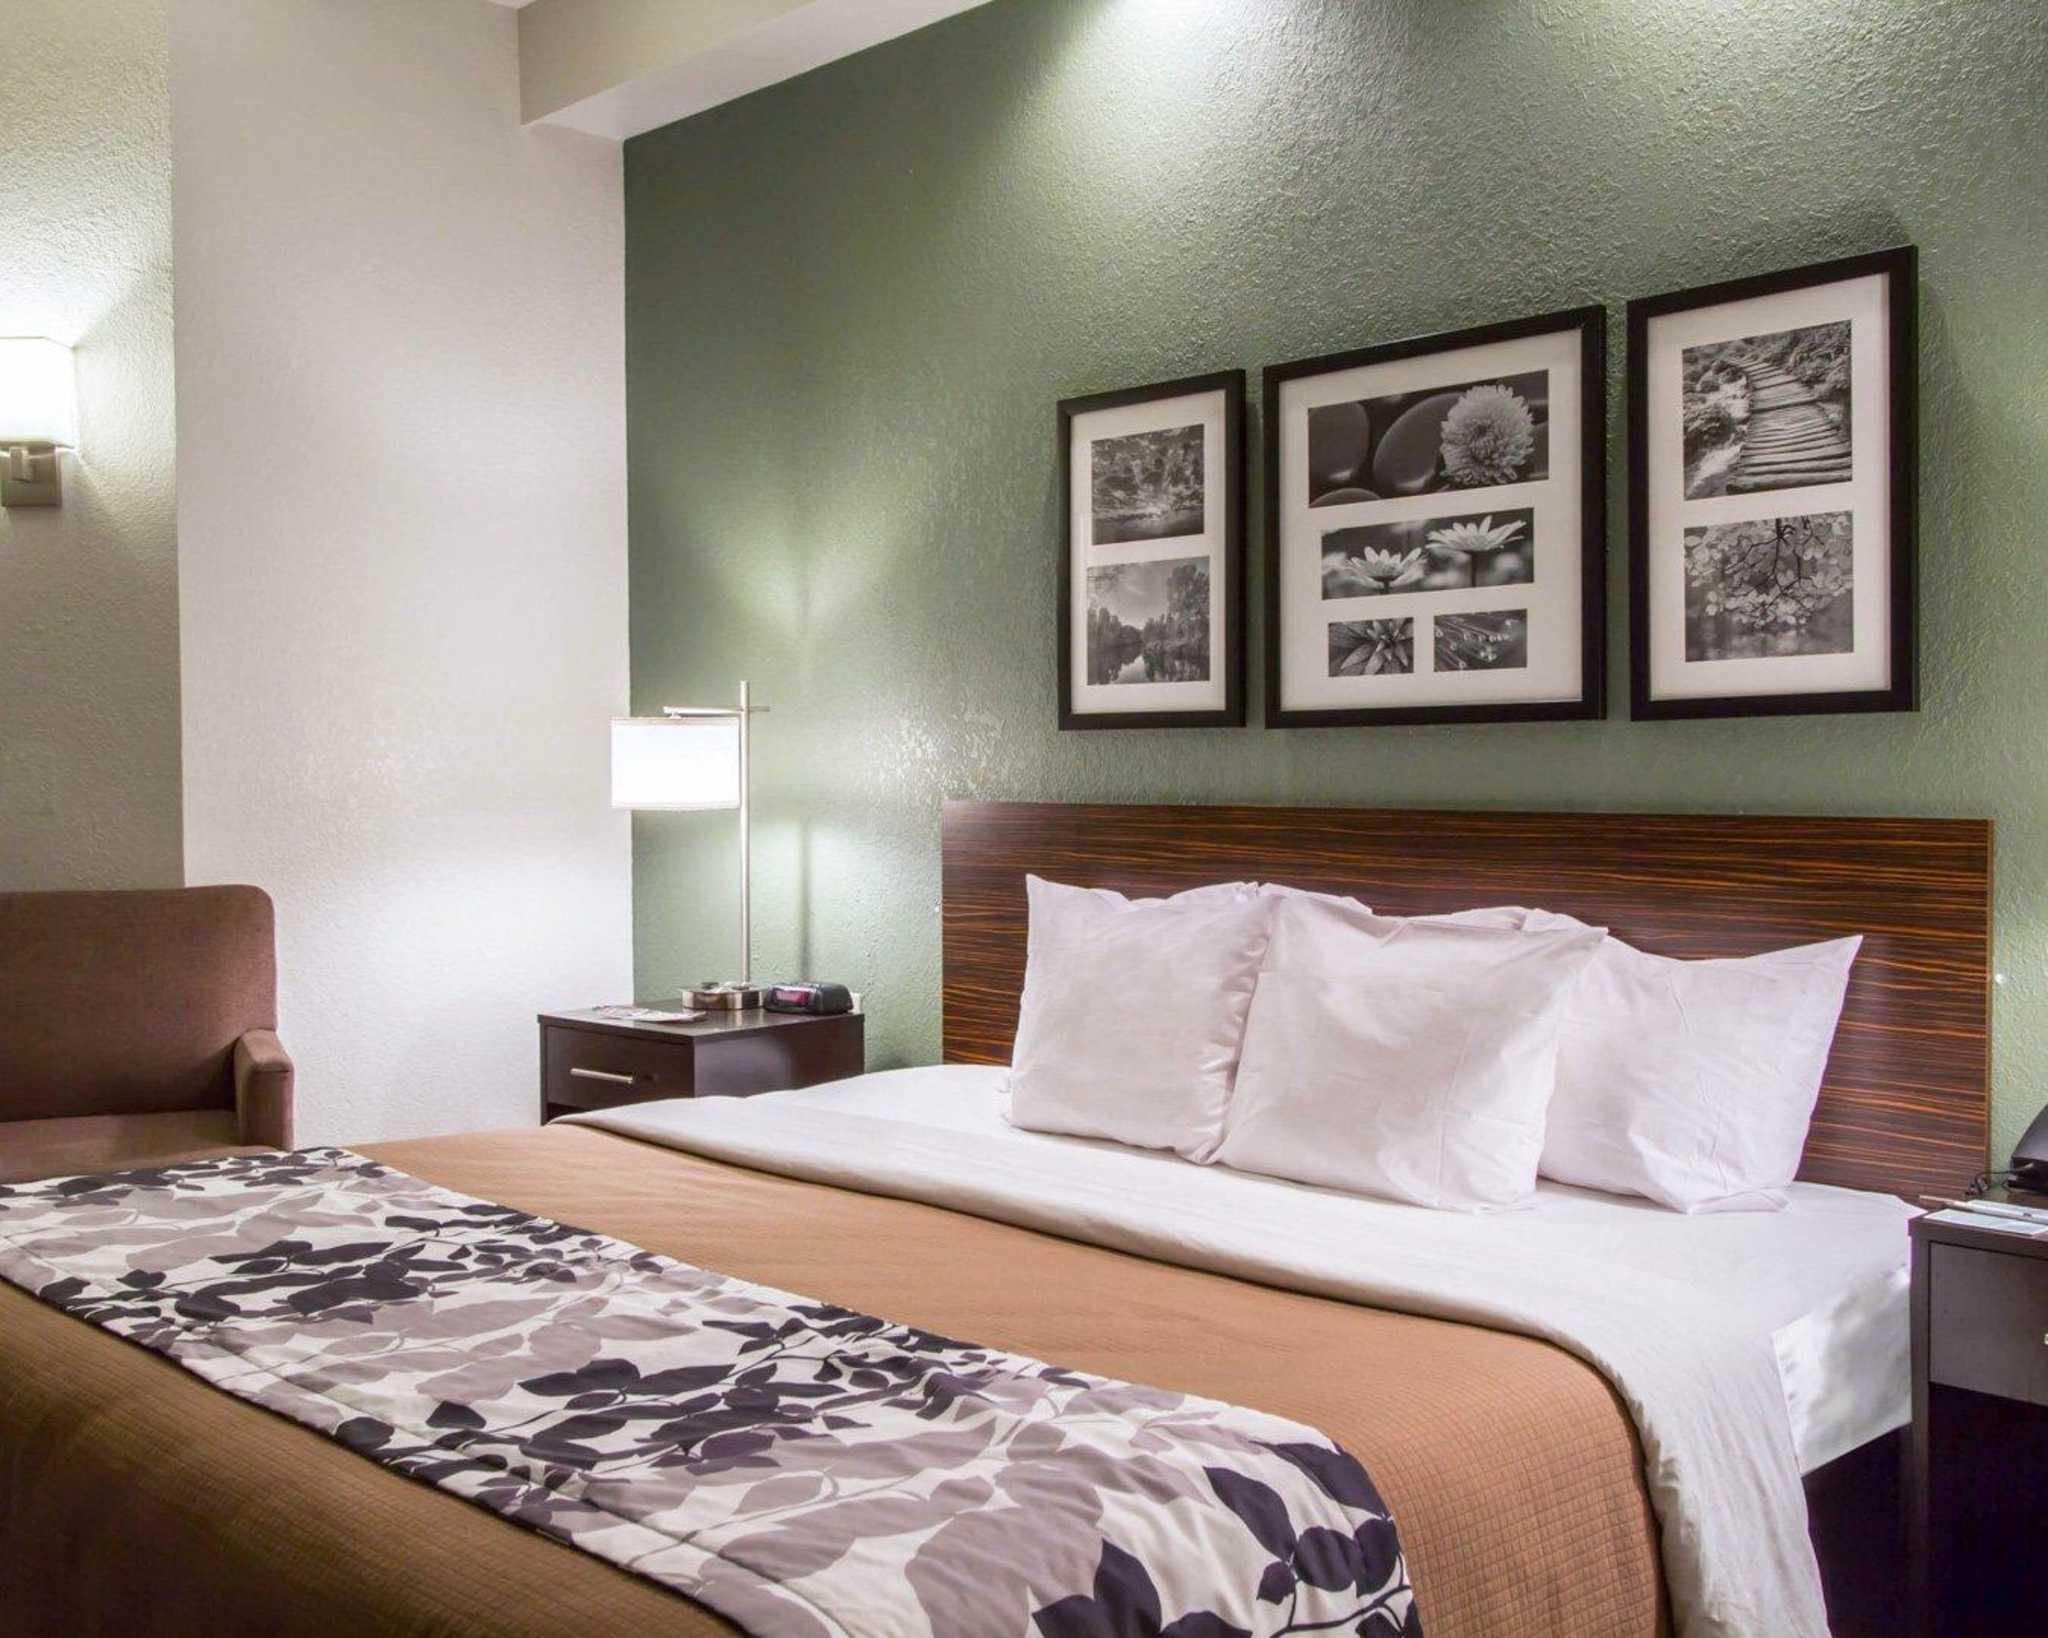 Sleep Inn & Suites Buffalo Airport image 0